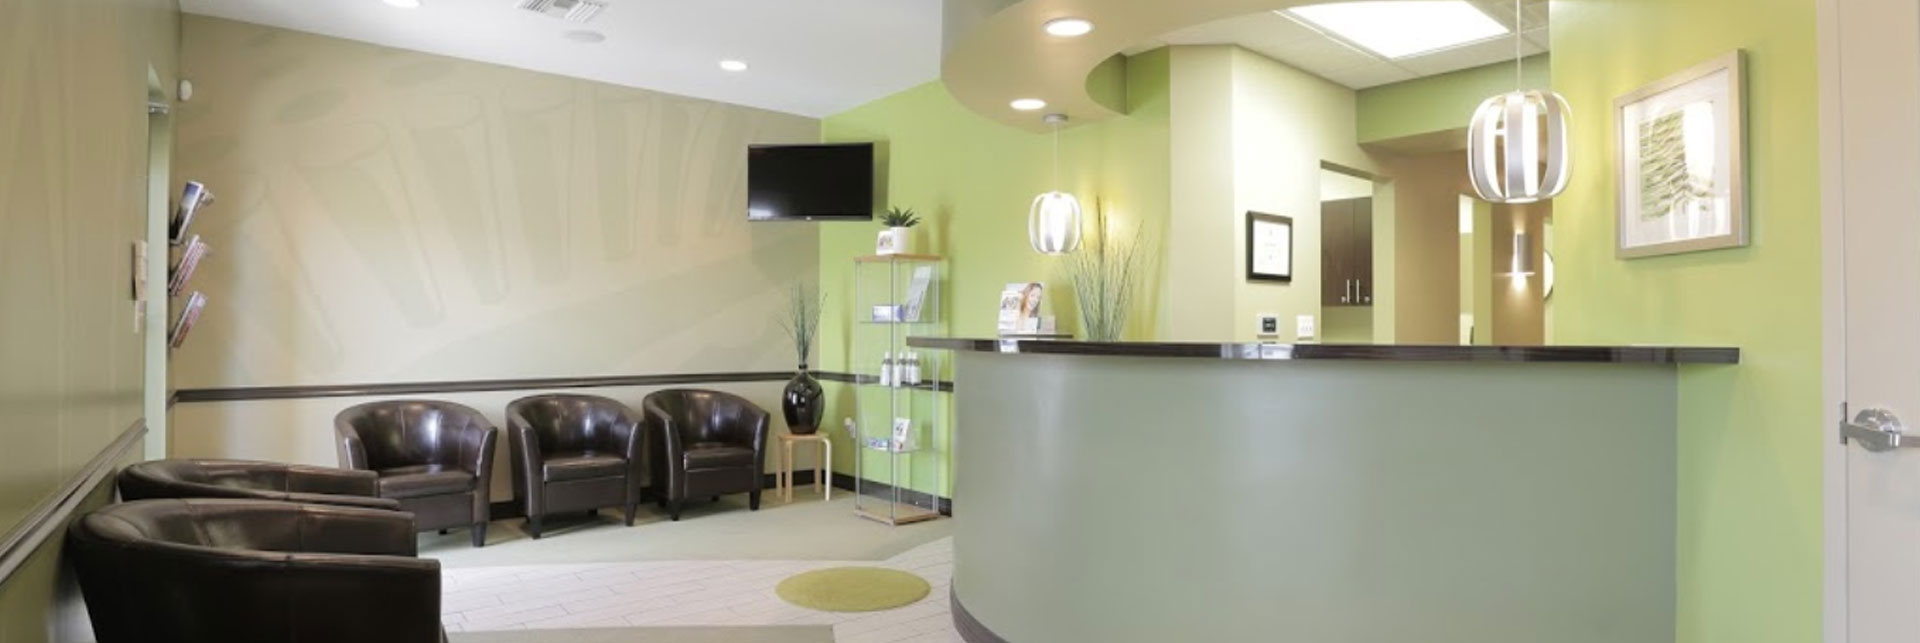 Inspiration Dental Front Office